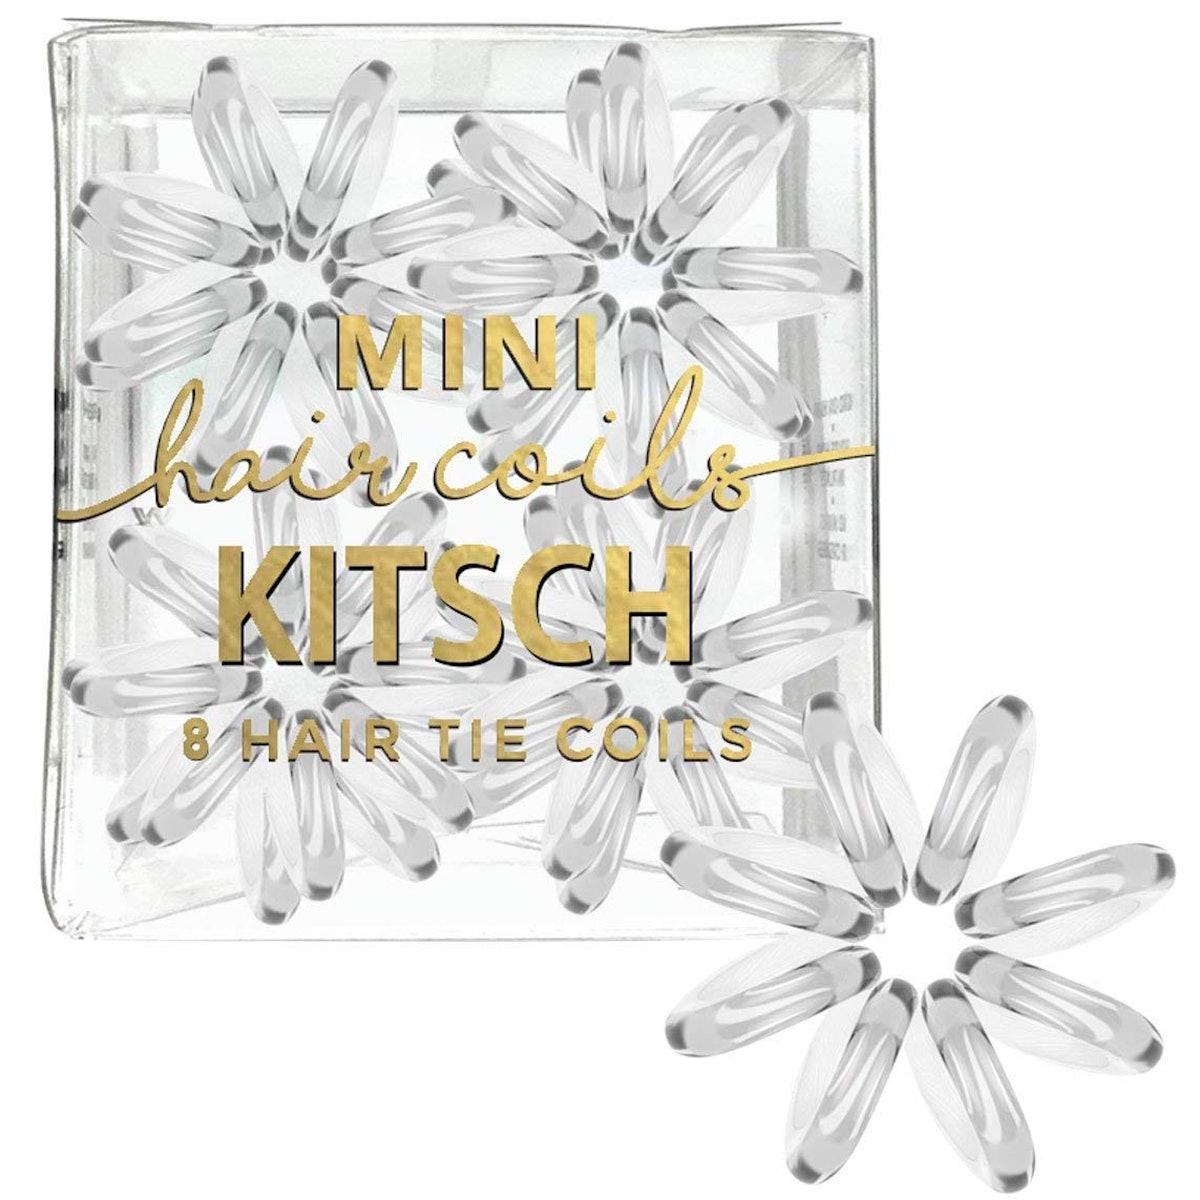 Kitsch Mini Spiral Hair Ties (8-Pack)